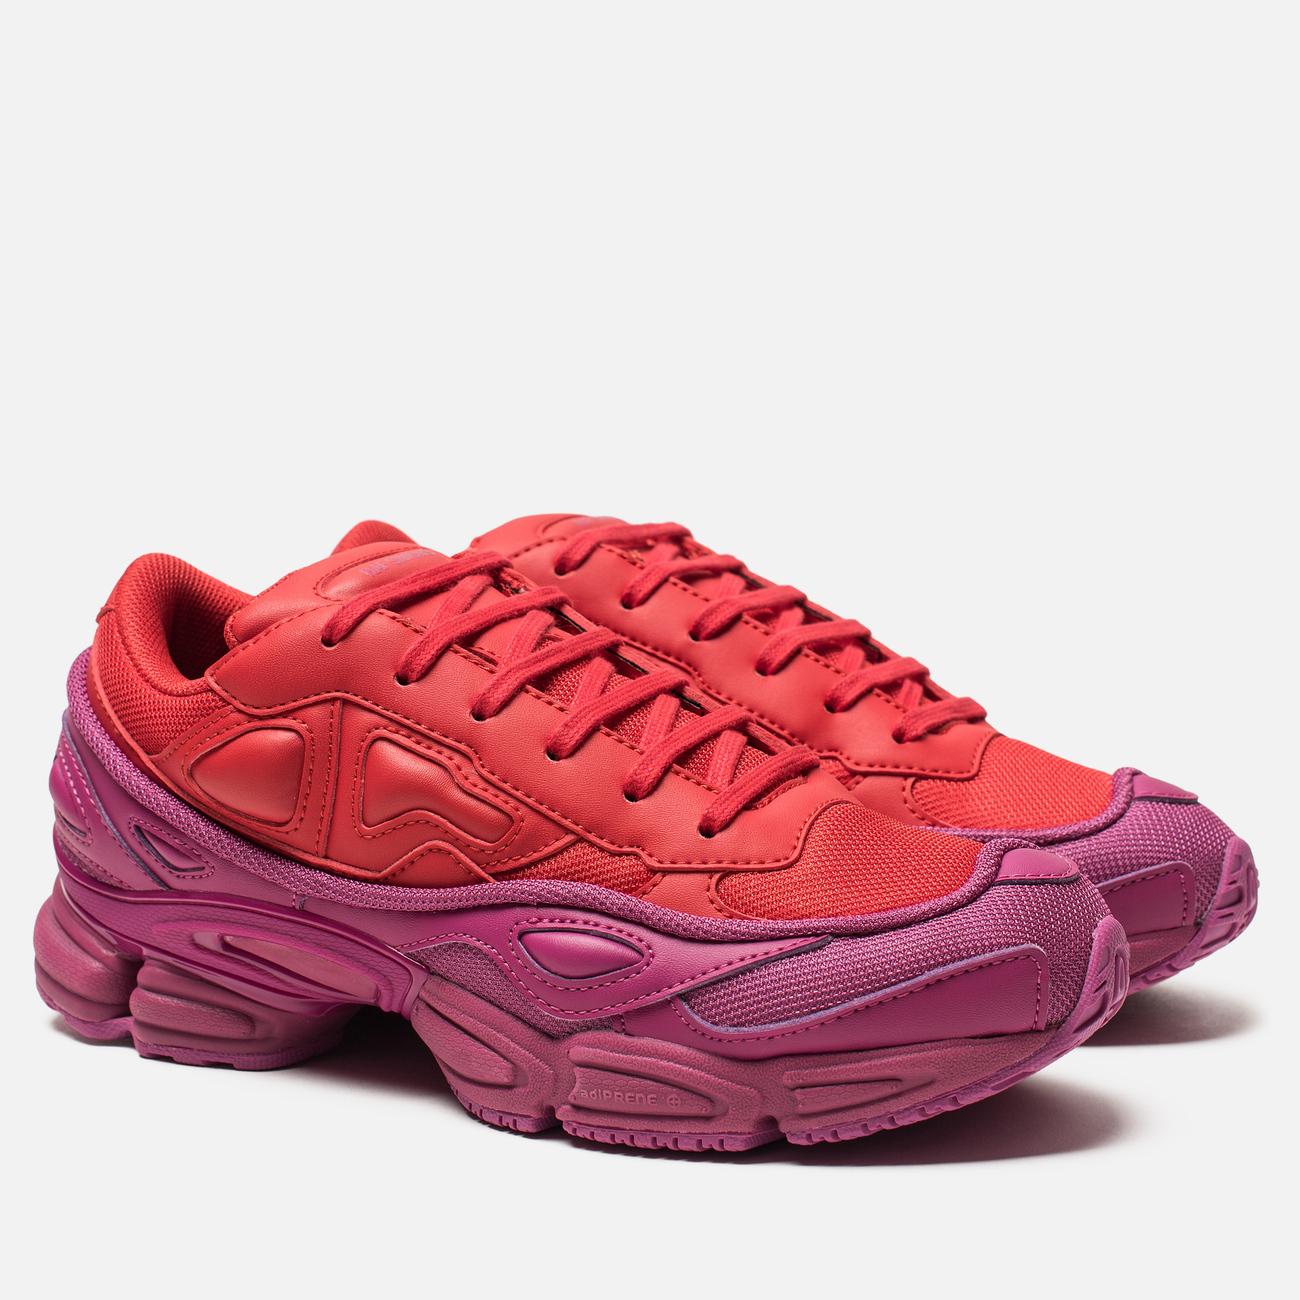 Кроссовки adidas Originals x Raf Simons Ozweego Glory/Collegiate Red/Collegiate Red